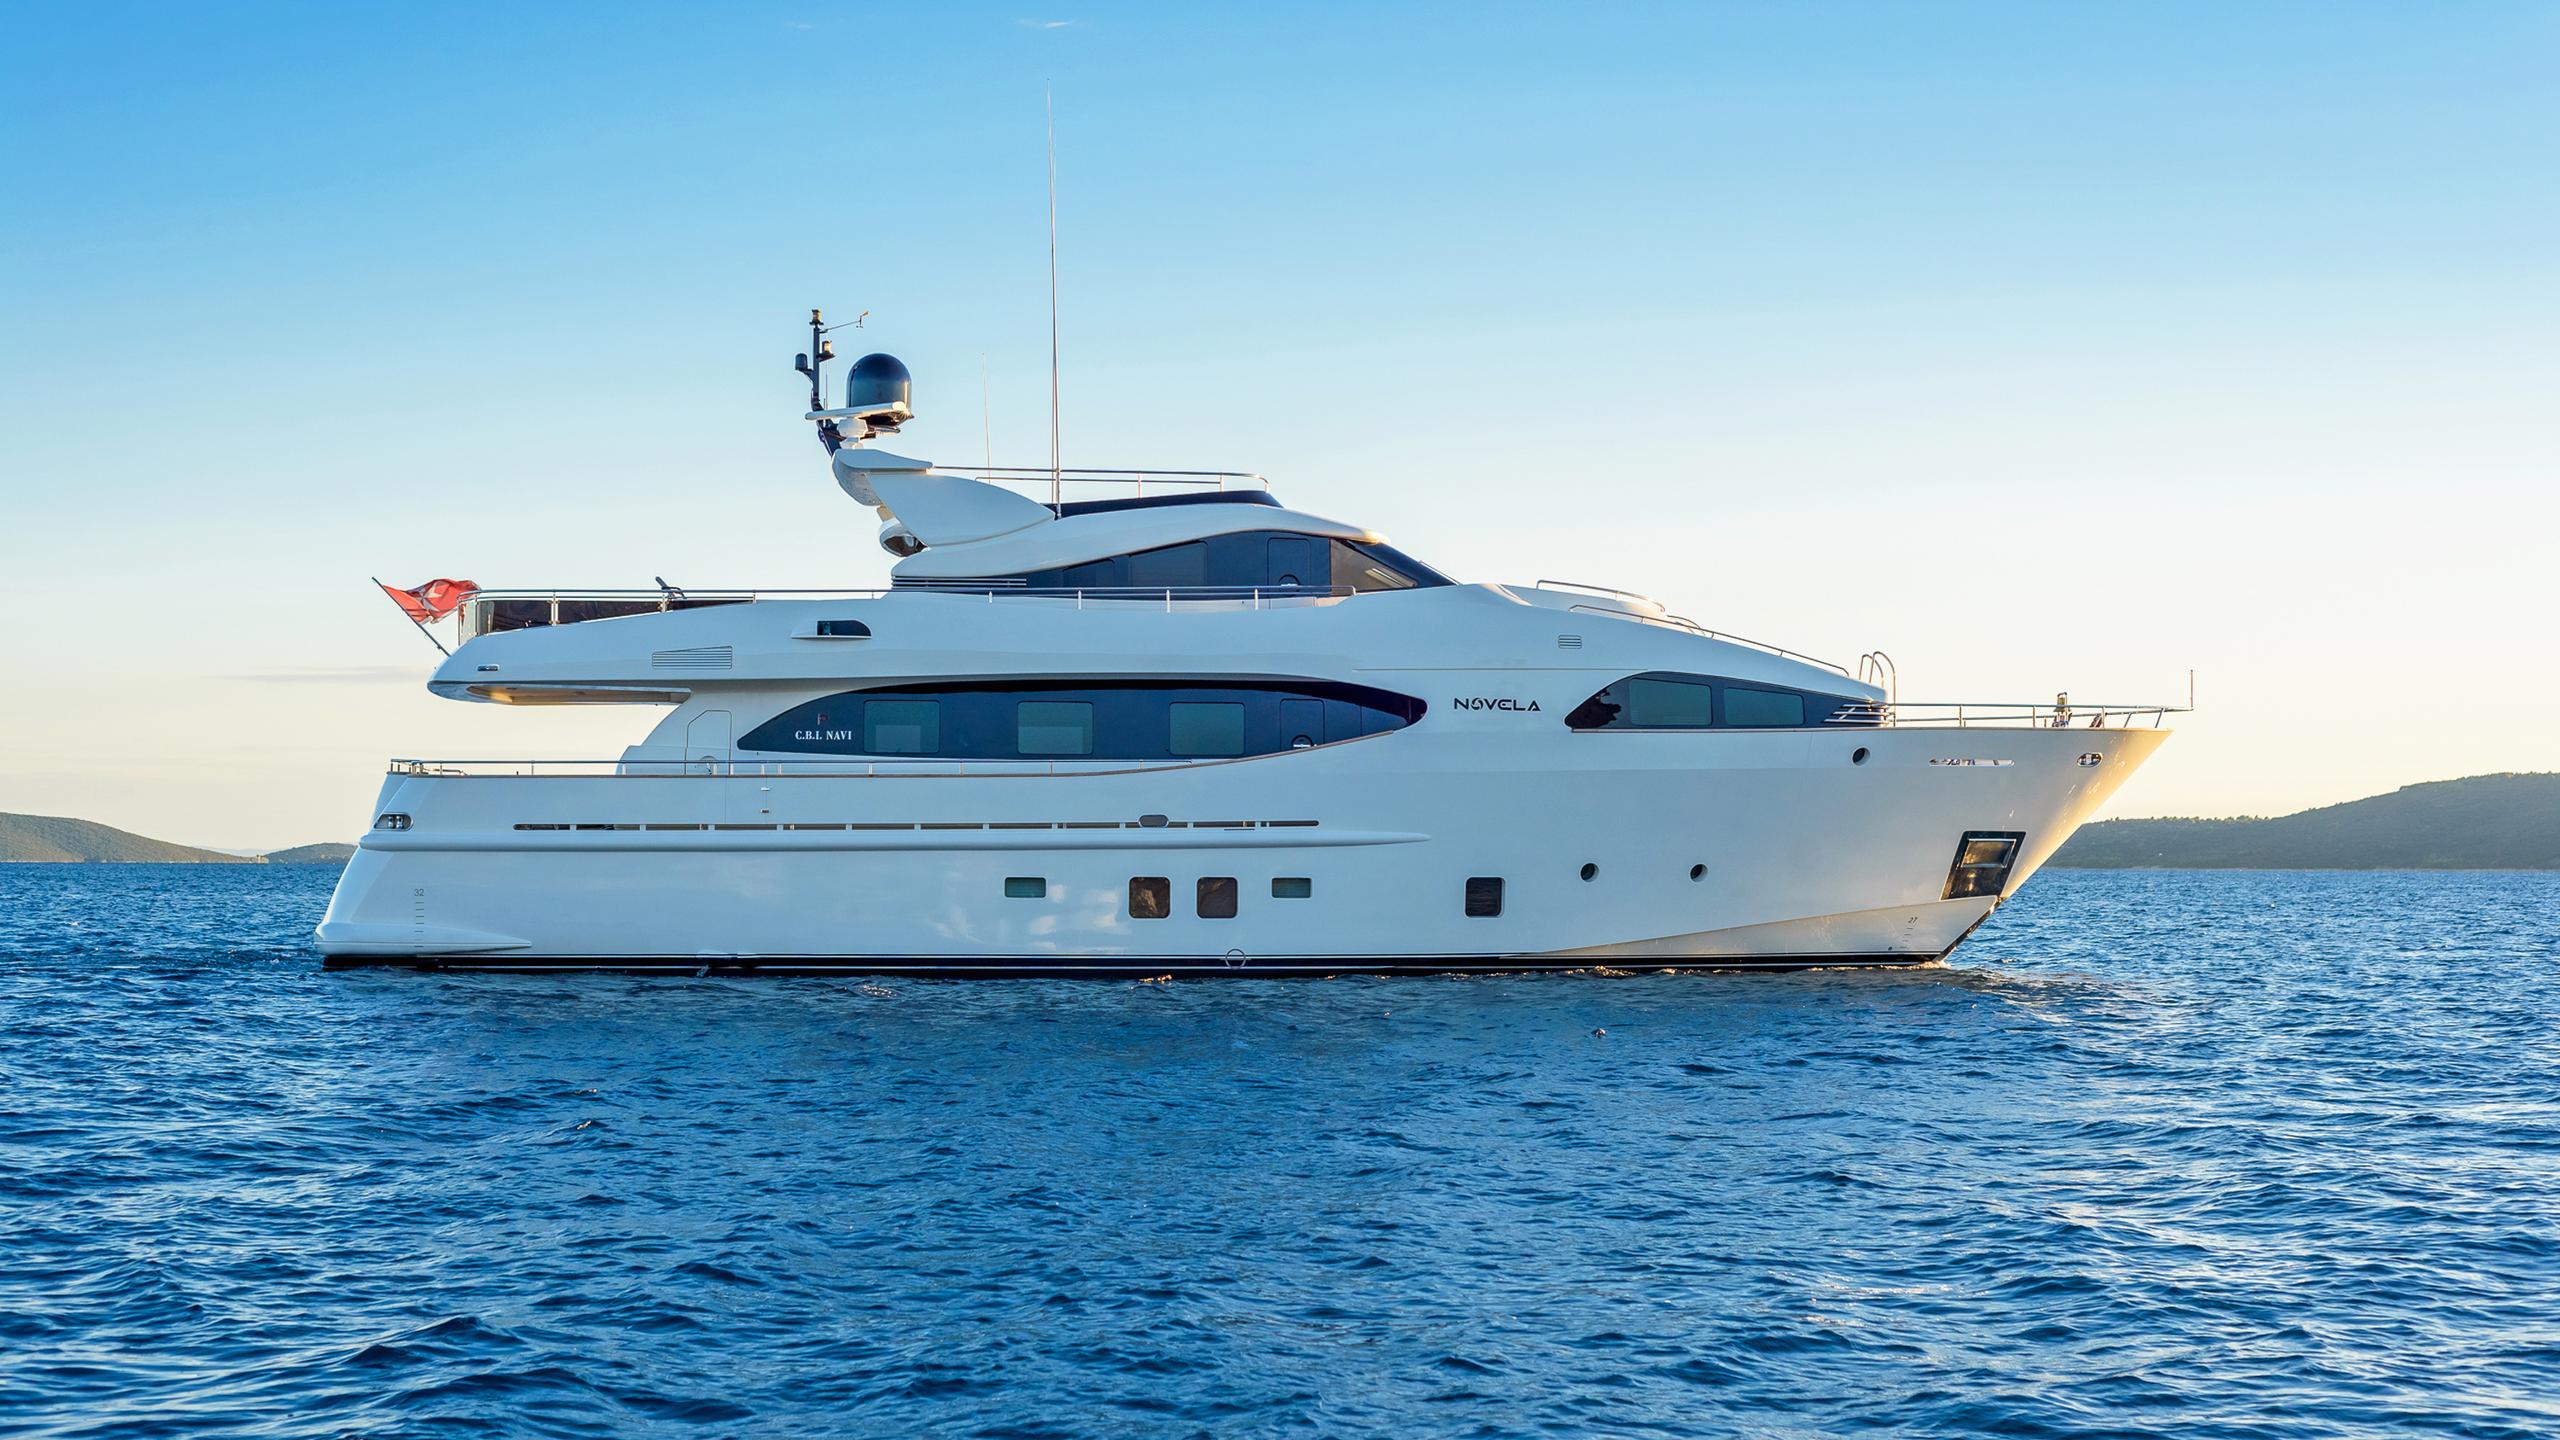 novela-yacht-for-charter-profile